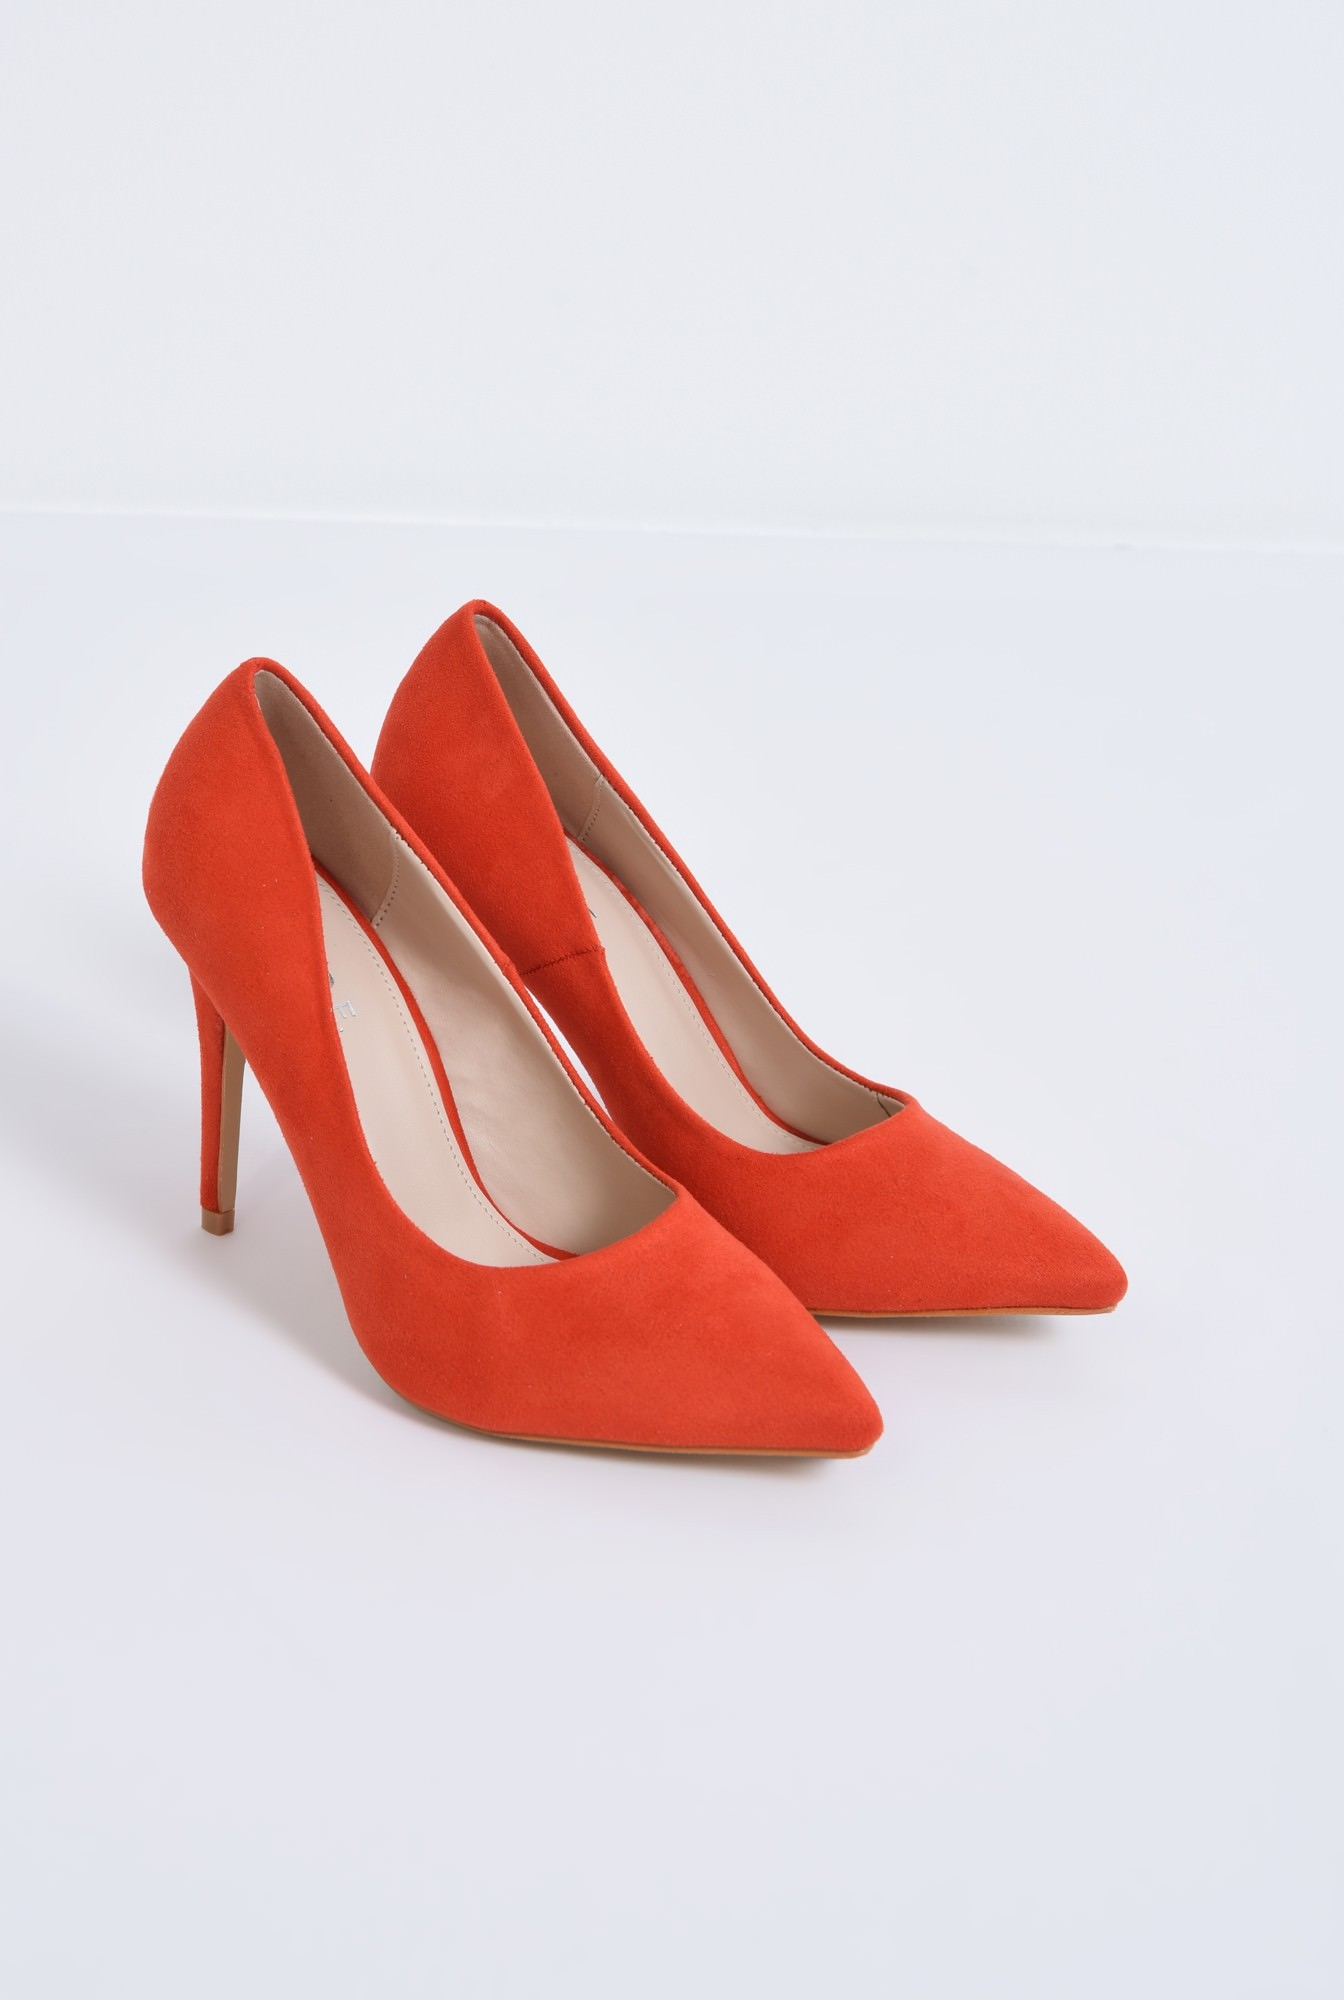 1 - pantofi casual, rosu, stiletto